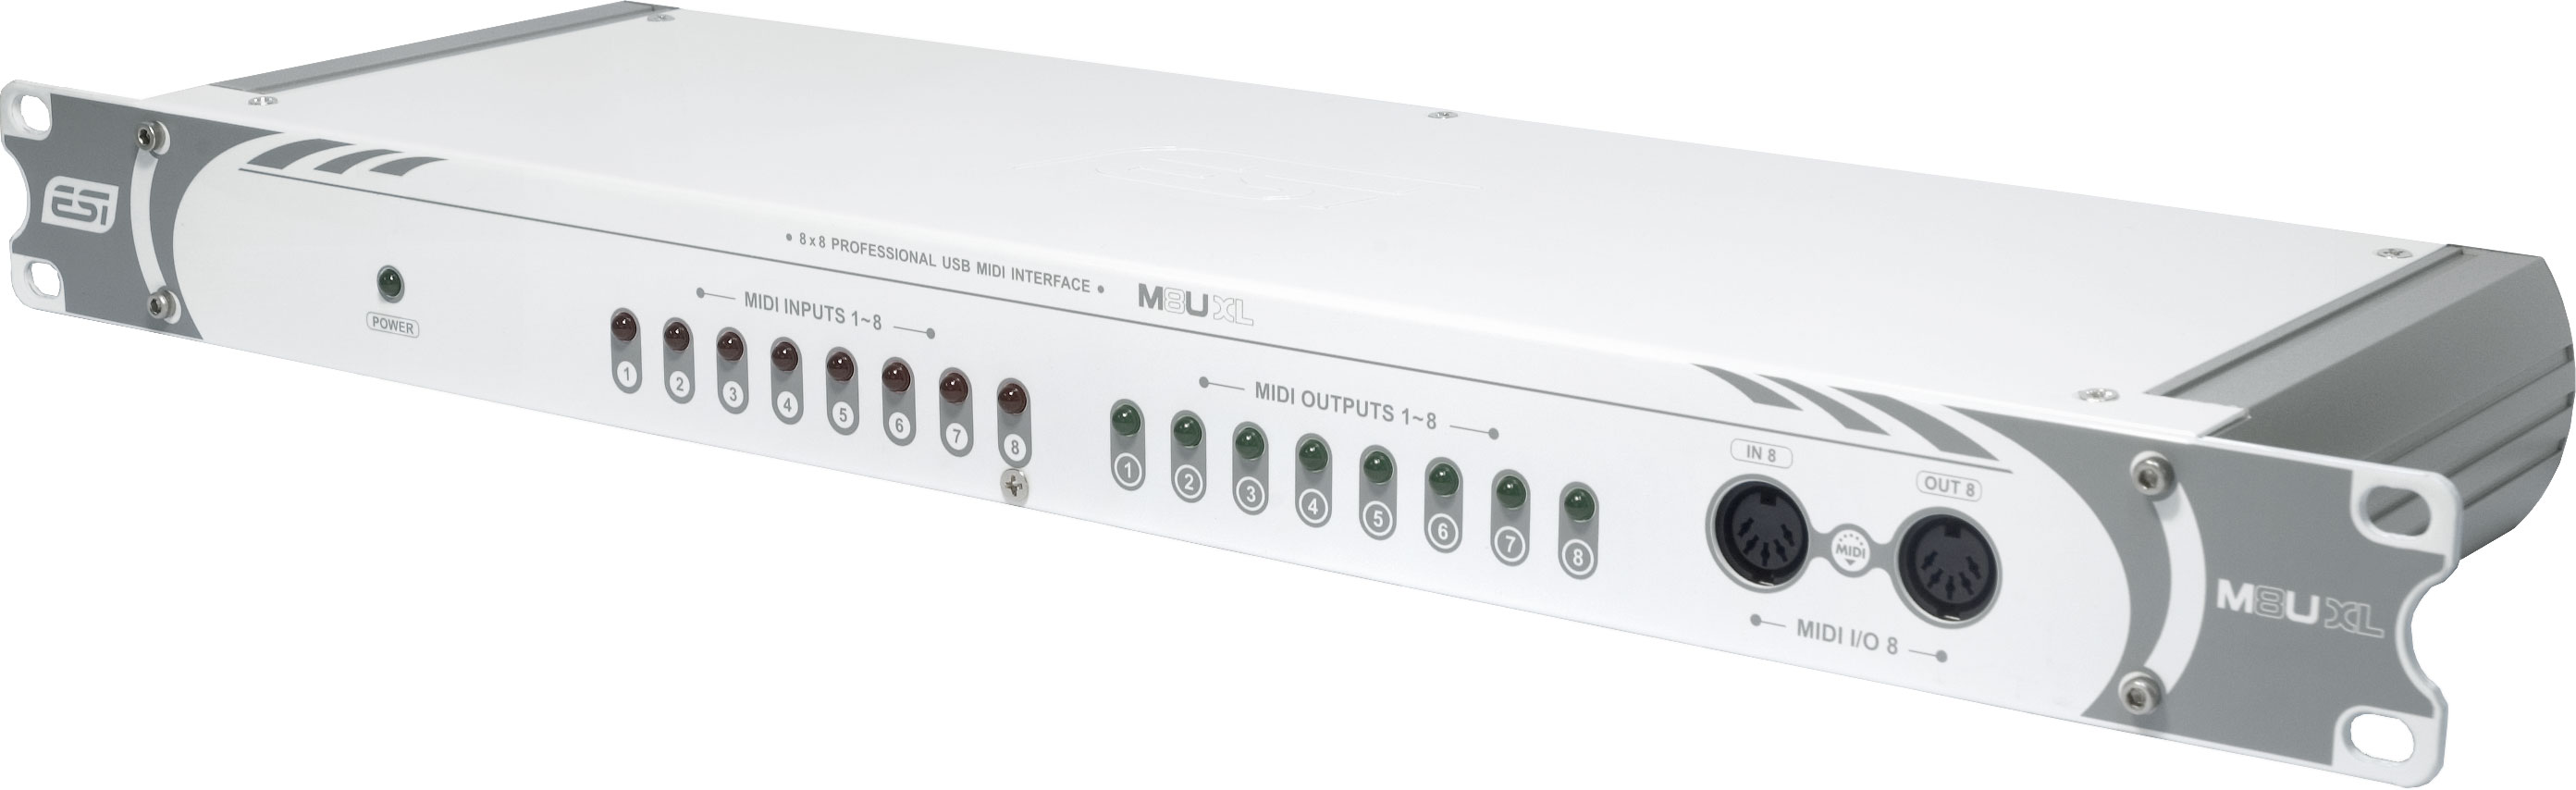 ESI M4U XL Audio Interface Windows 8 Drivers Download (2019)